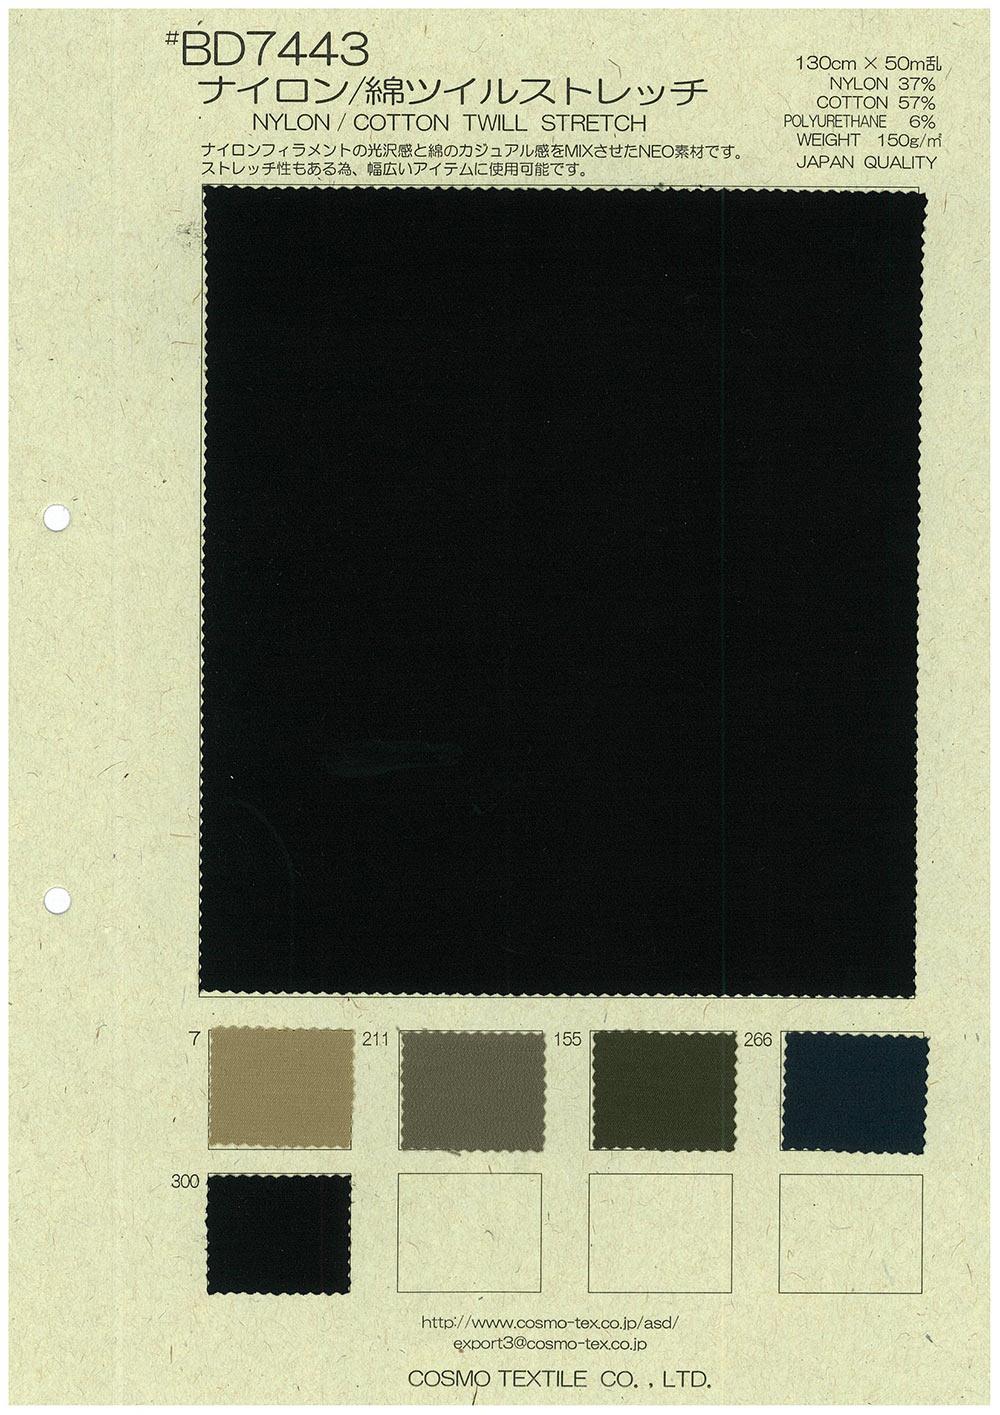 BD7443 NCストレッチ[生地] コスモテキスタイル/オークラ商事 - ApparelX アパレル資材卸通販